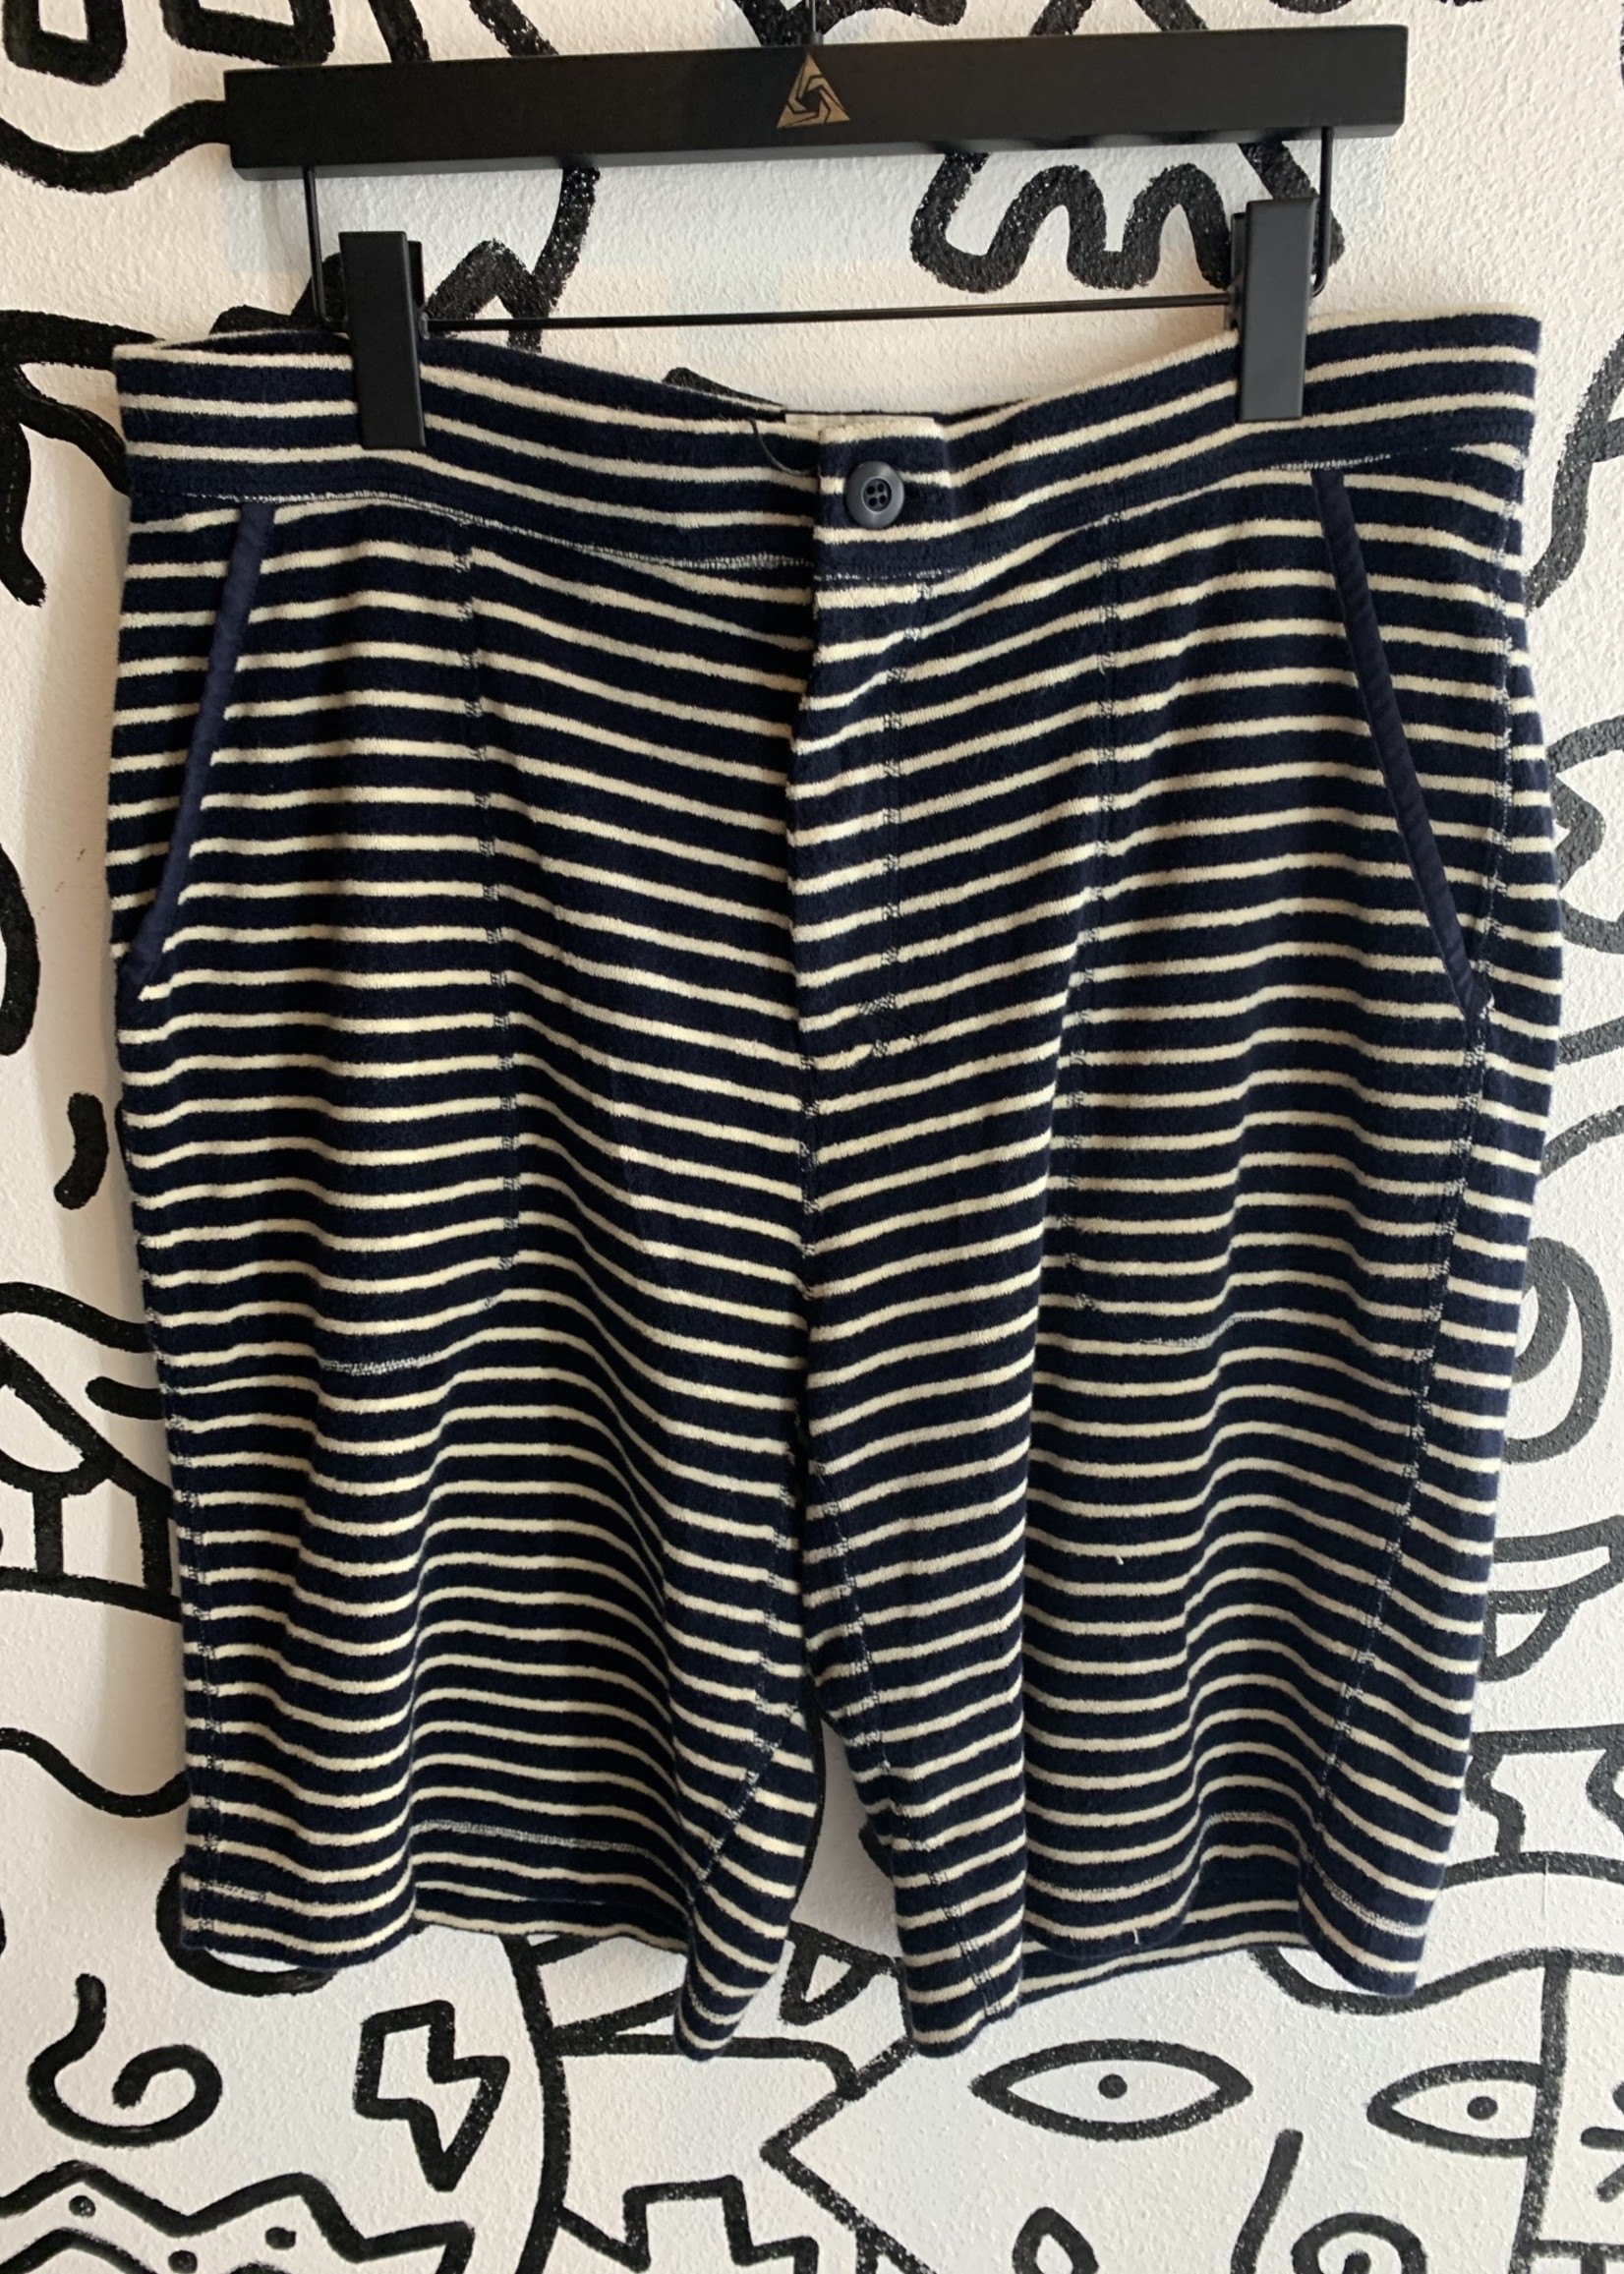 Snowpeak Terry Cloth Striped Shorts XXL